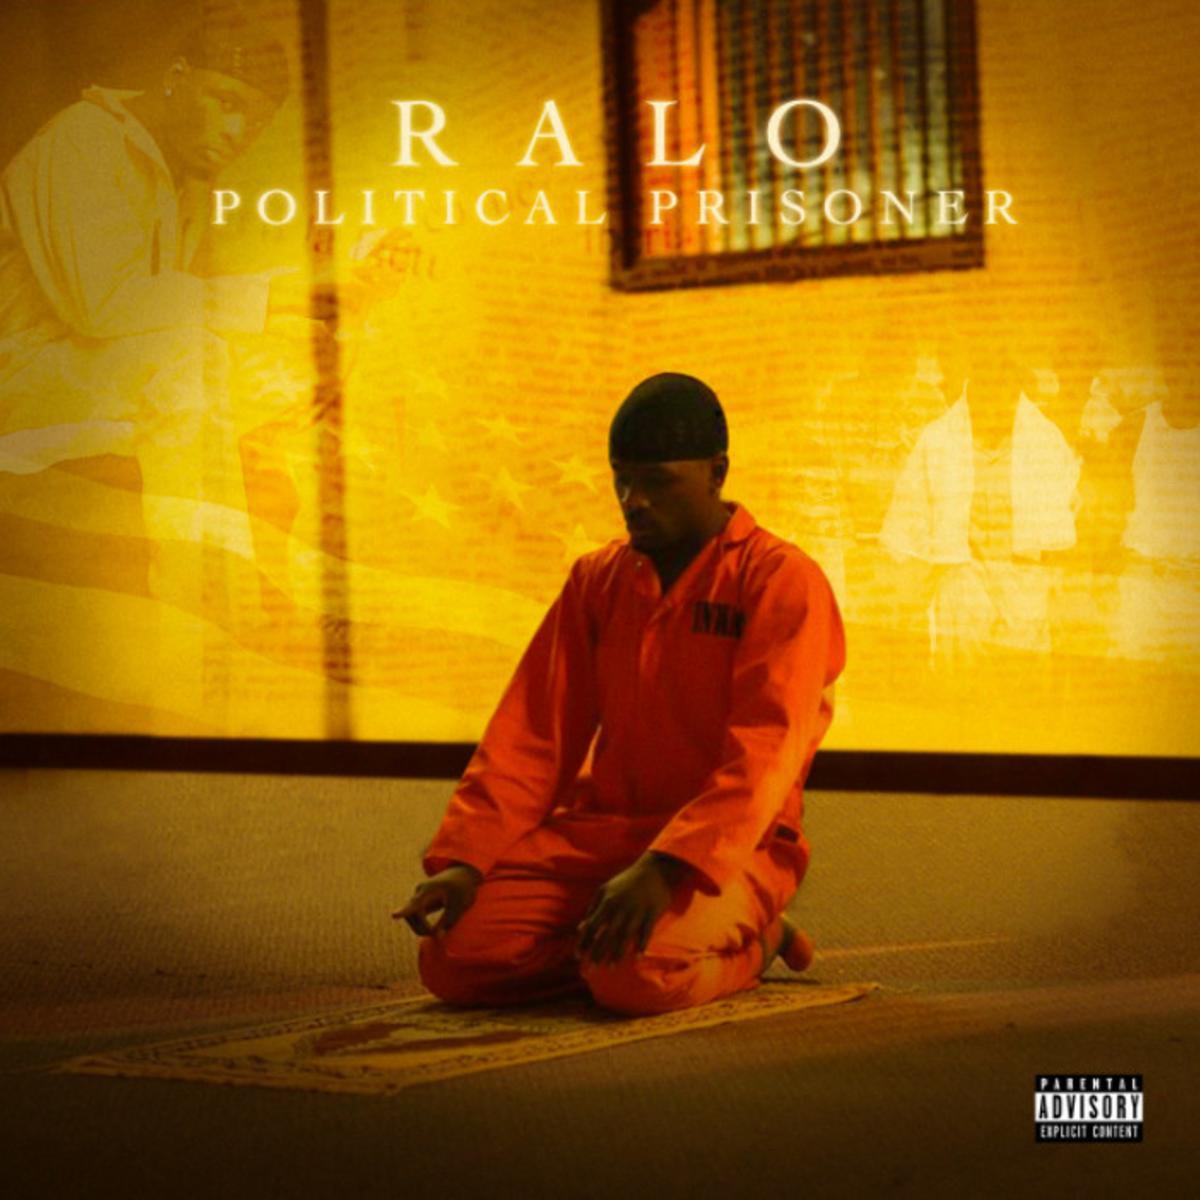 MP3: Ralo - I Want It